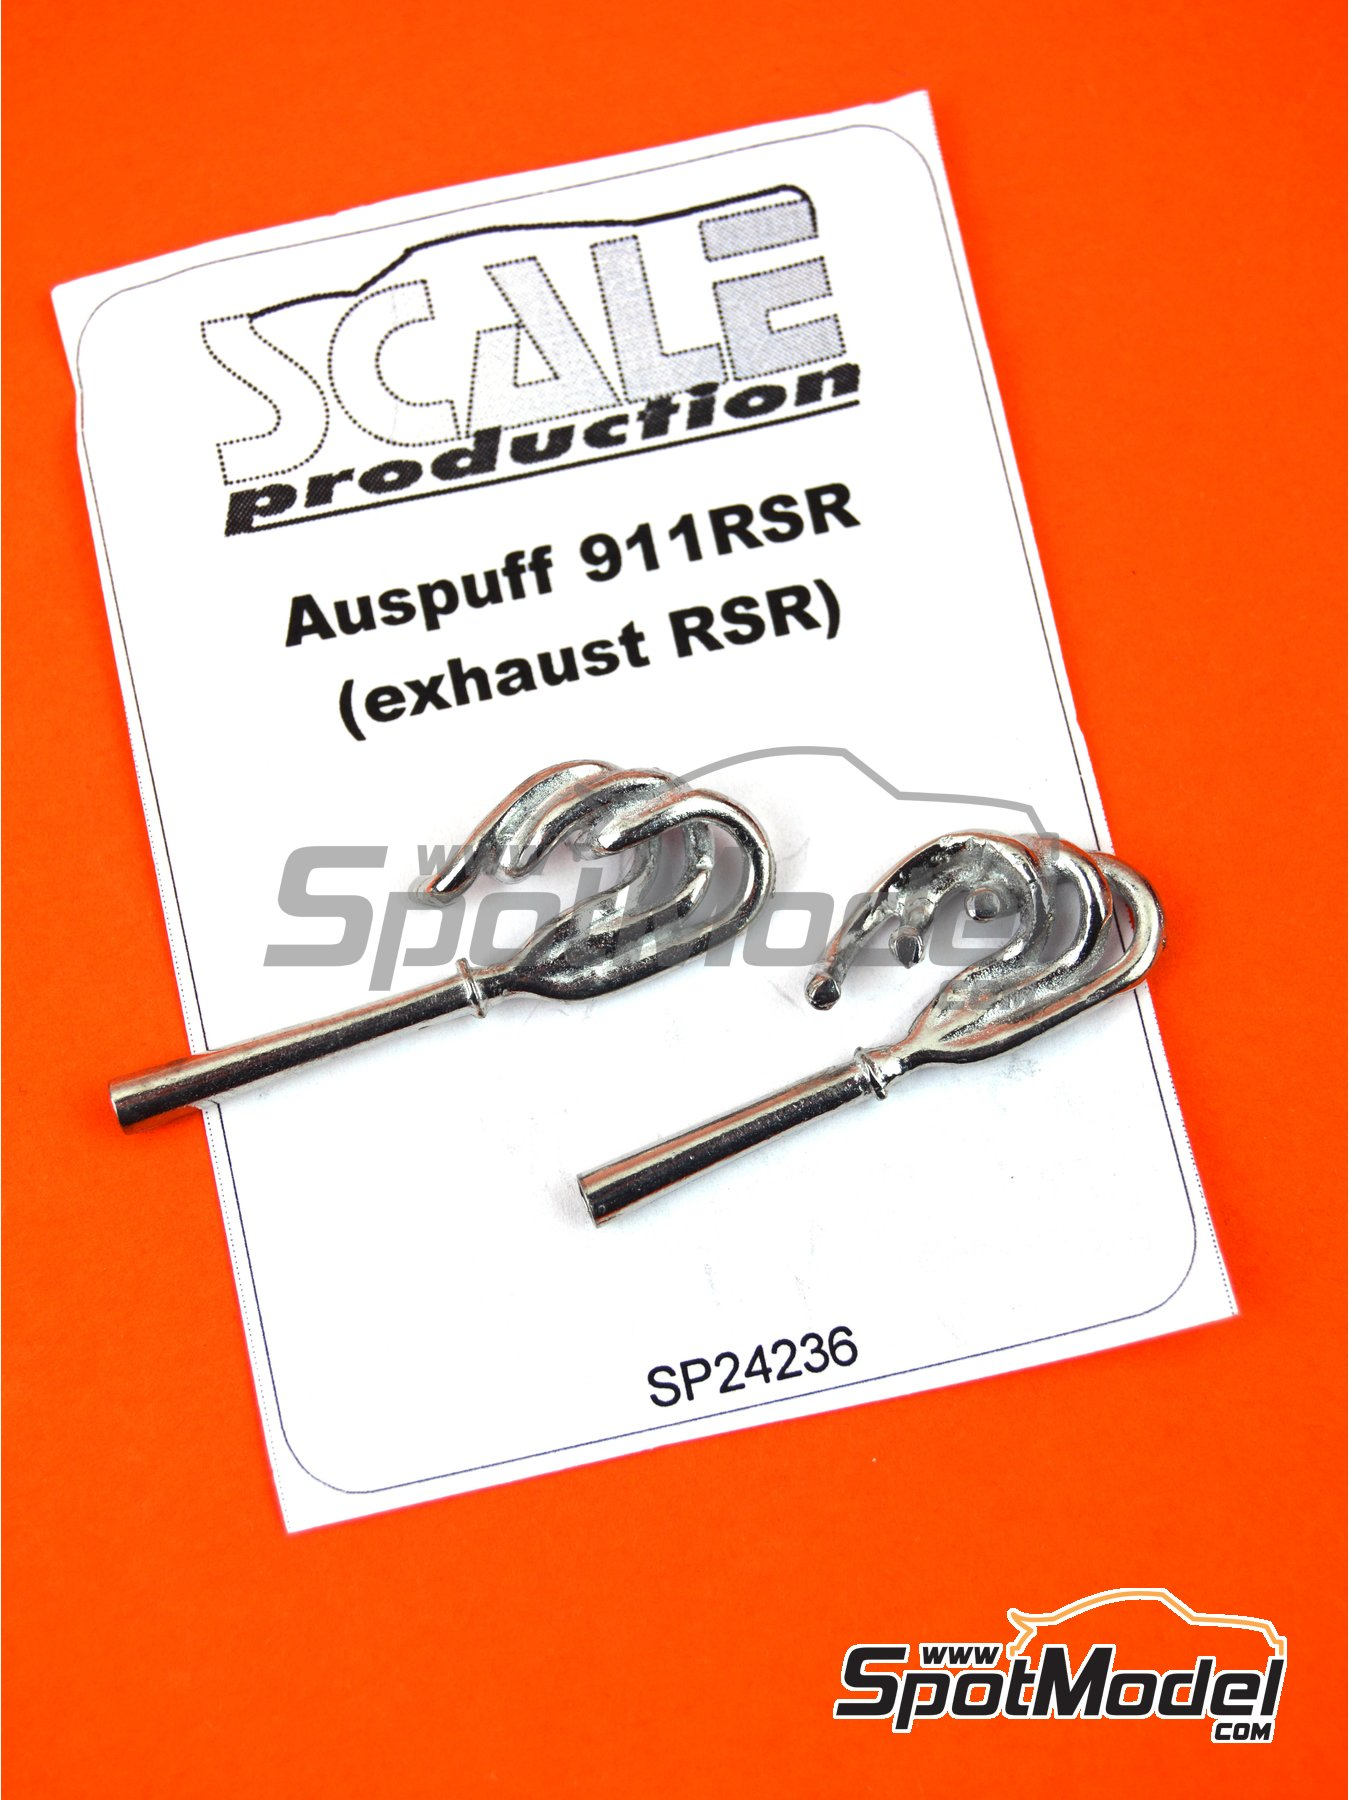 Porsche 911 RSR | Escapes en escala1/24 fabricado por Scale Production (ref.SP24236) image